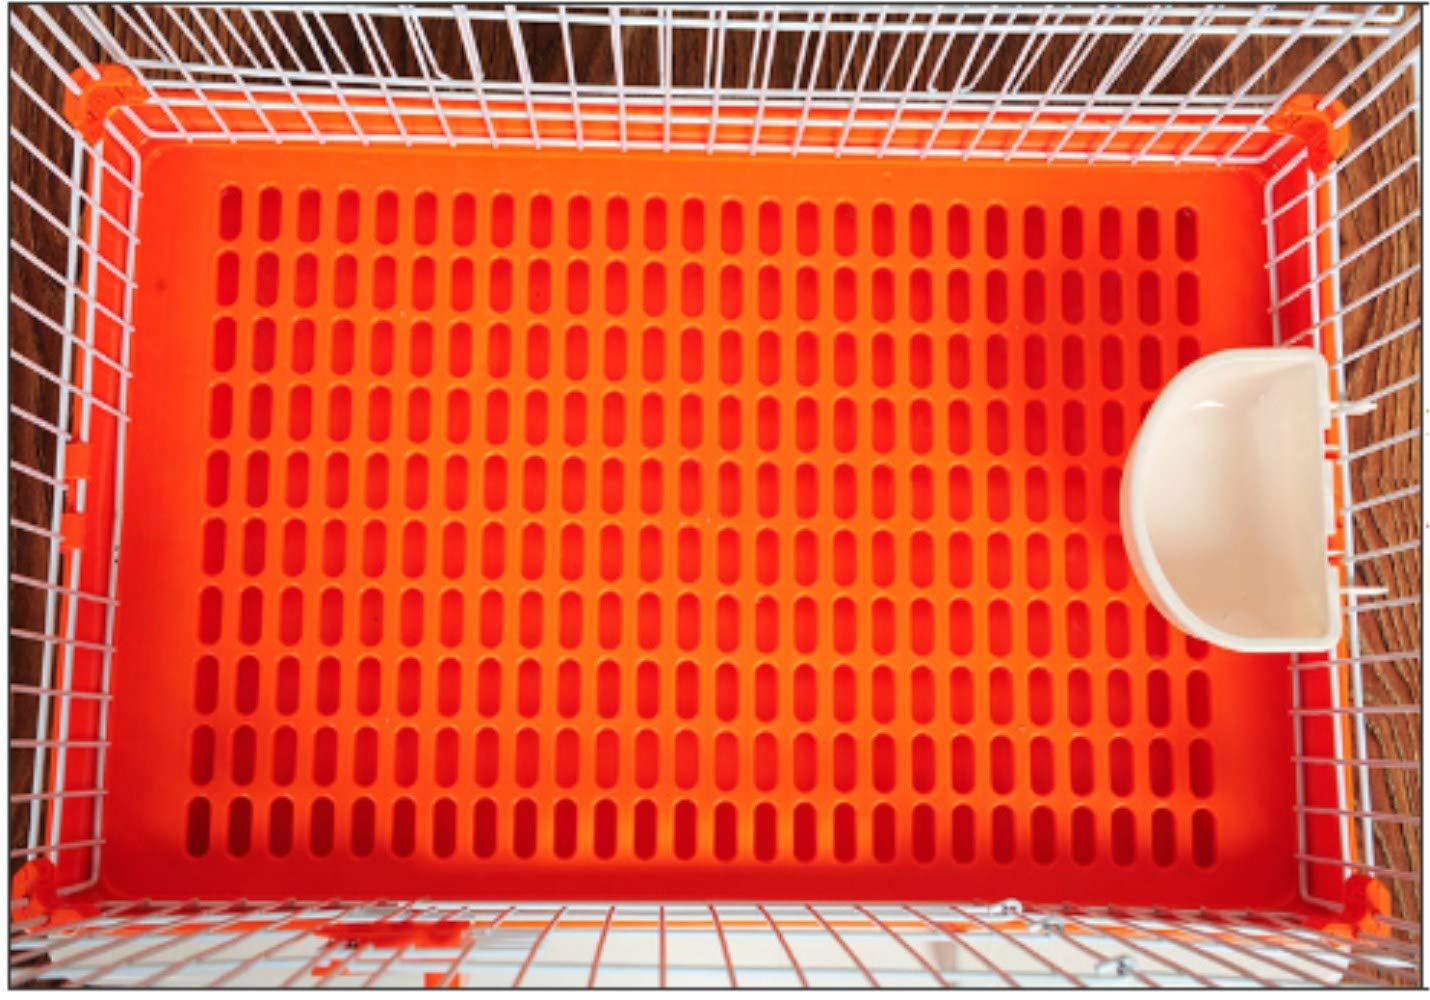 orange 684449cm orange 684449cm YAMERIJIA Dog Cage, Cat Cage, Dog Pet Fence, Pet Supplies